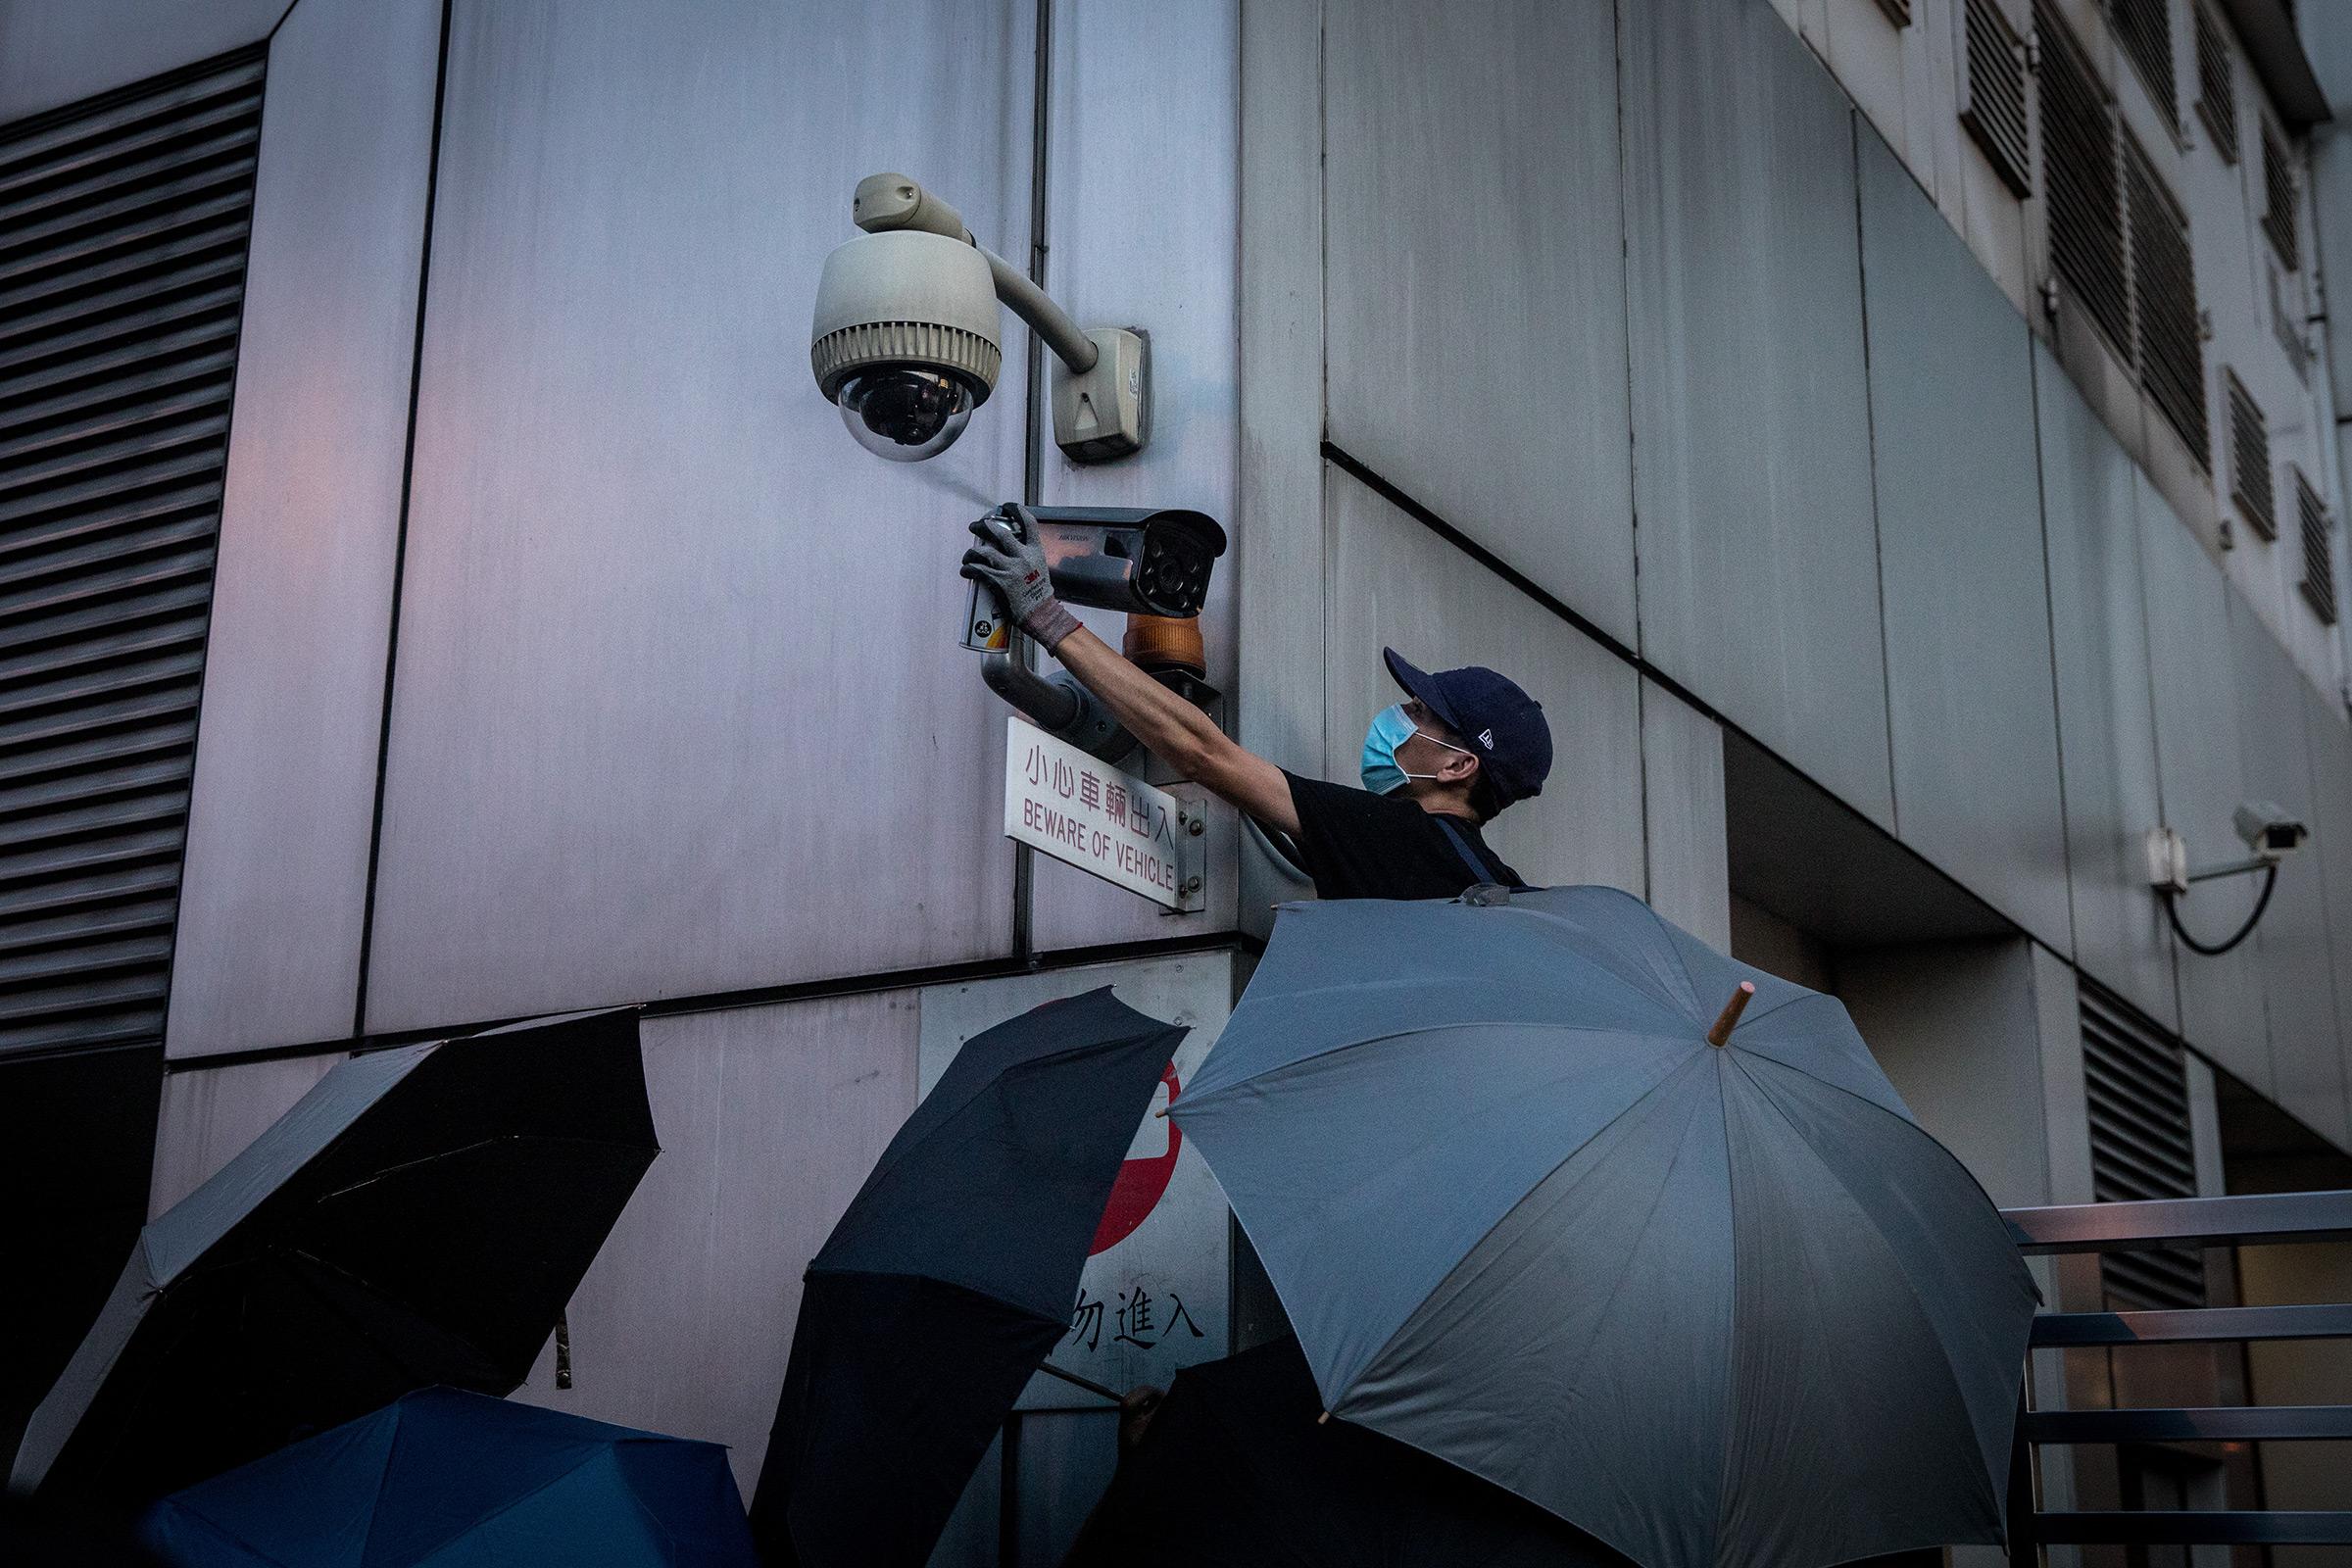 Can you mount a camera recording a public street?